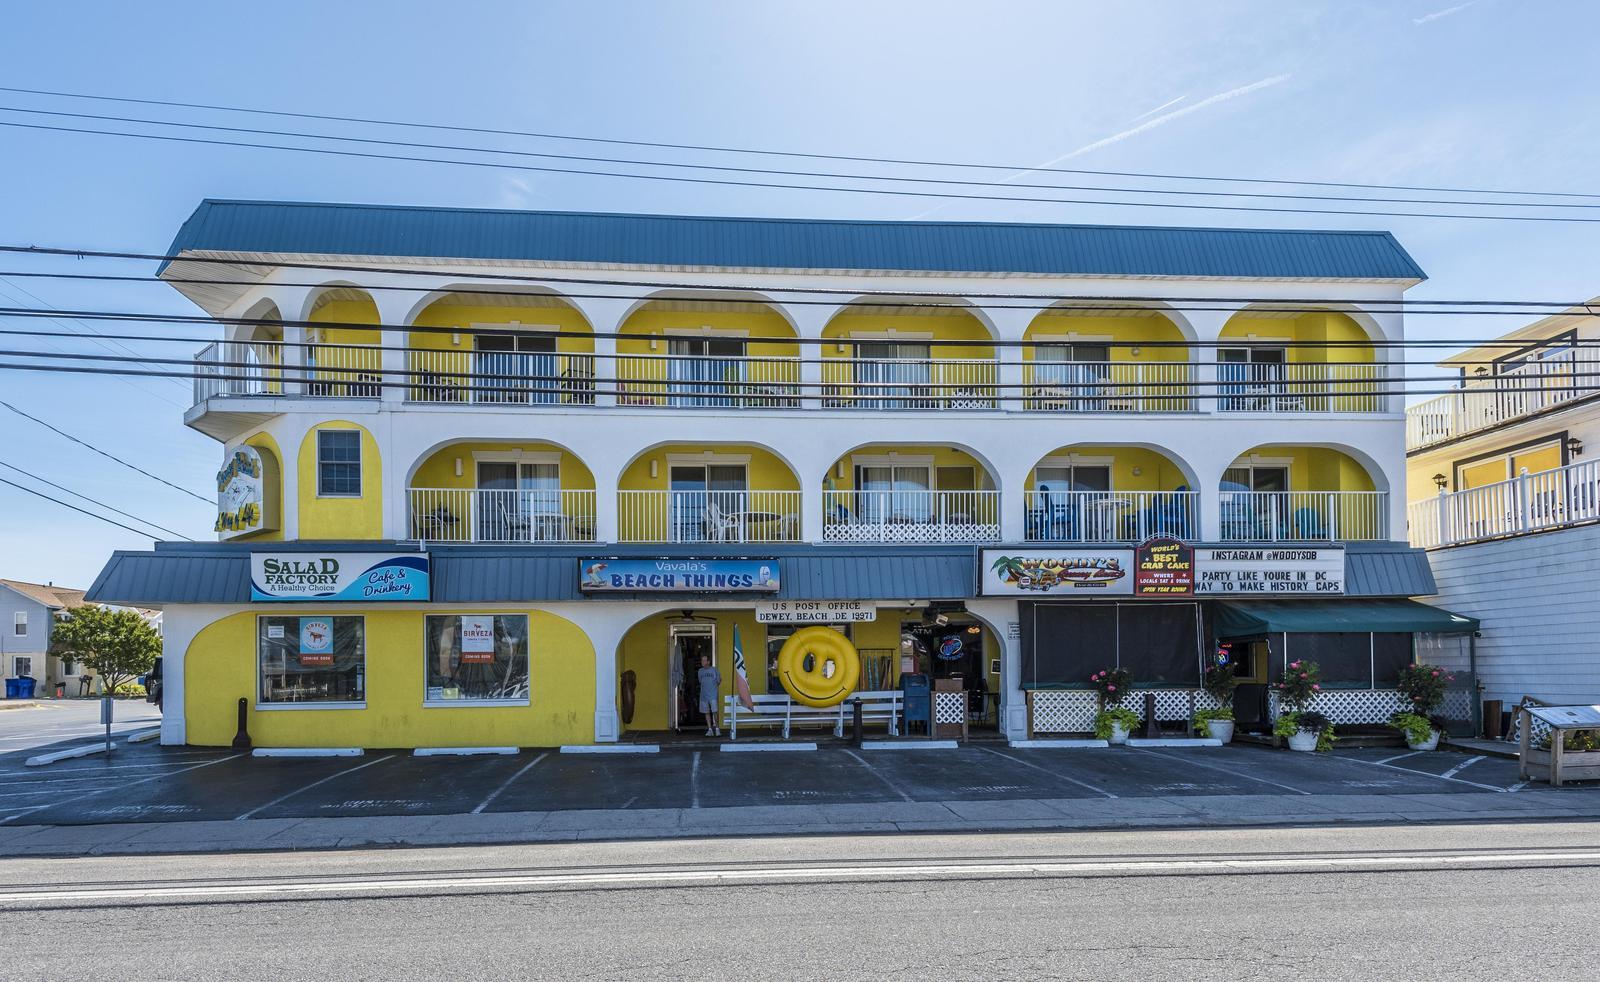 Front side of the Surfrider Condominium building